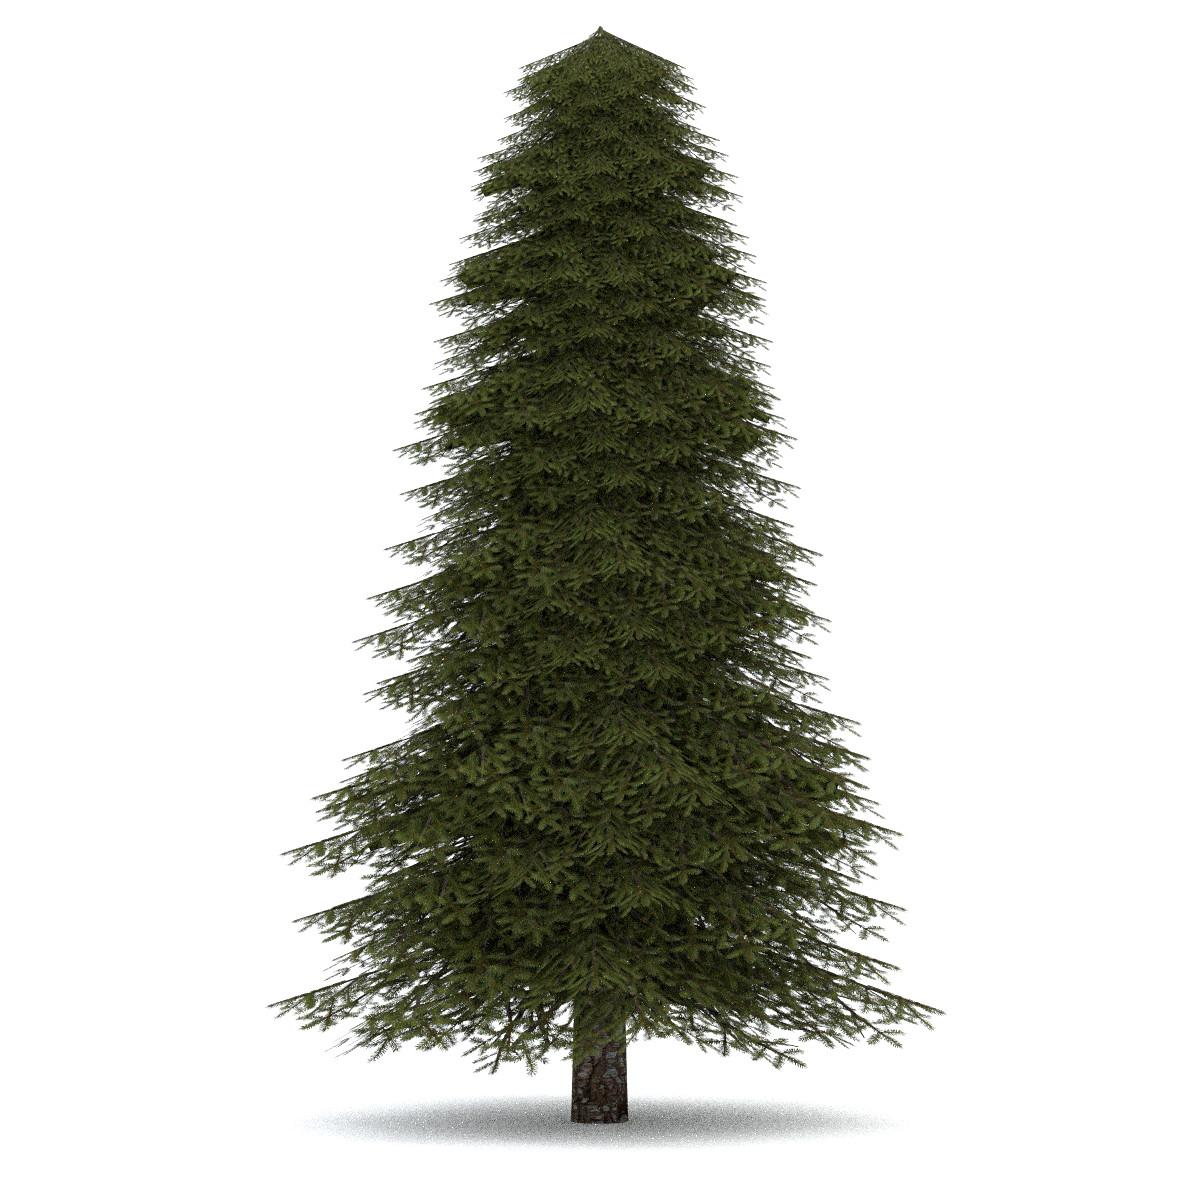 Cute Wallpaper Recycling 3d Realistic Fir Tree 2